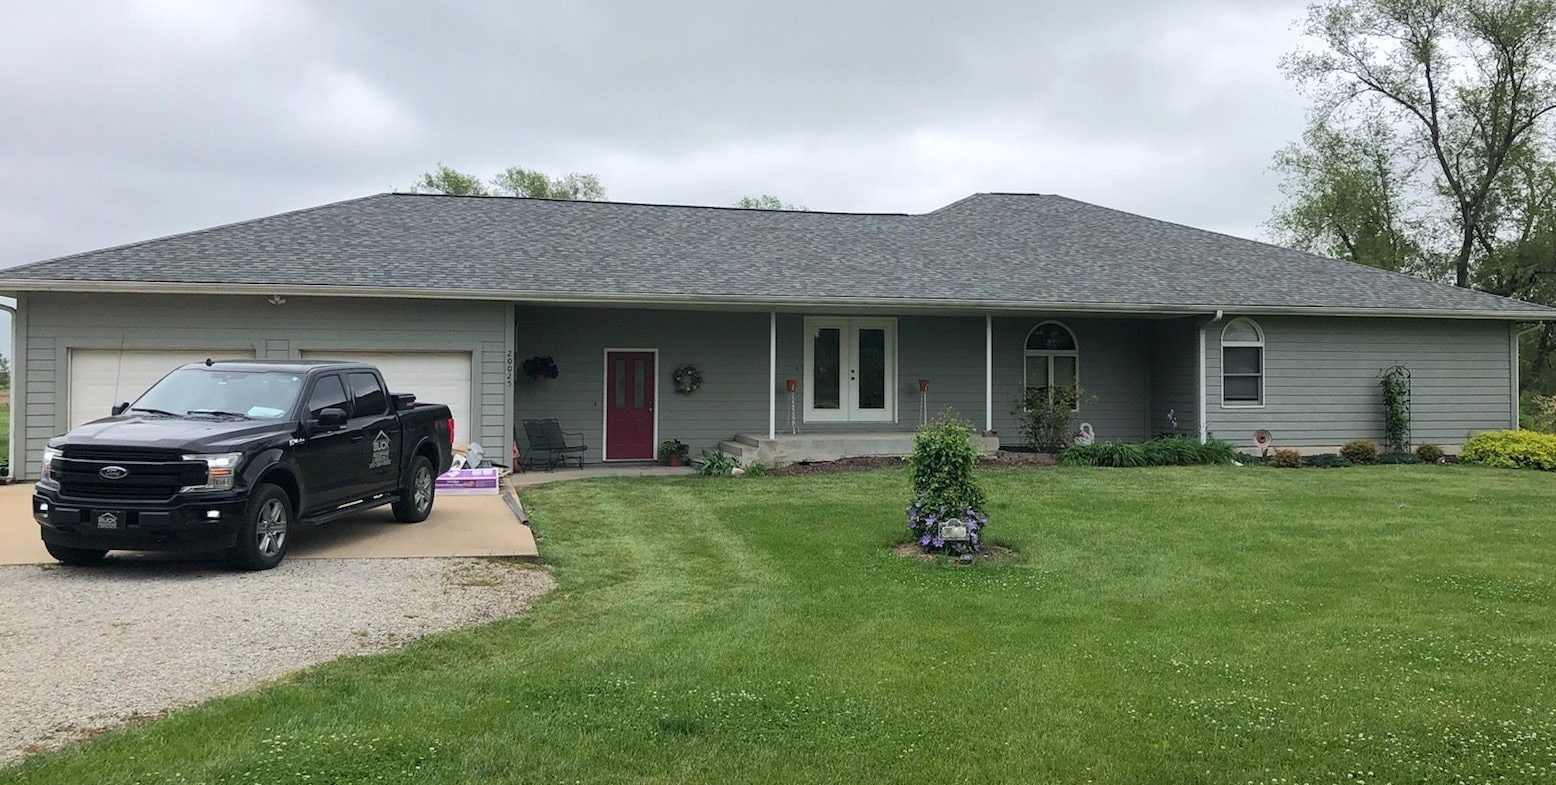 Buck Roofing - Residential Roofing - Kansas and Missouri - Certainteed Landmark - Georgetown Gray - Certainteed Shadow Ridge